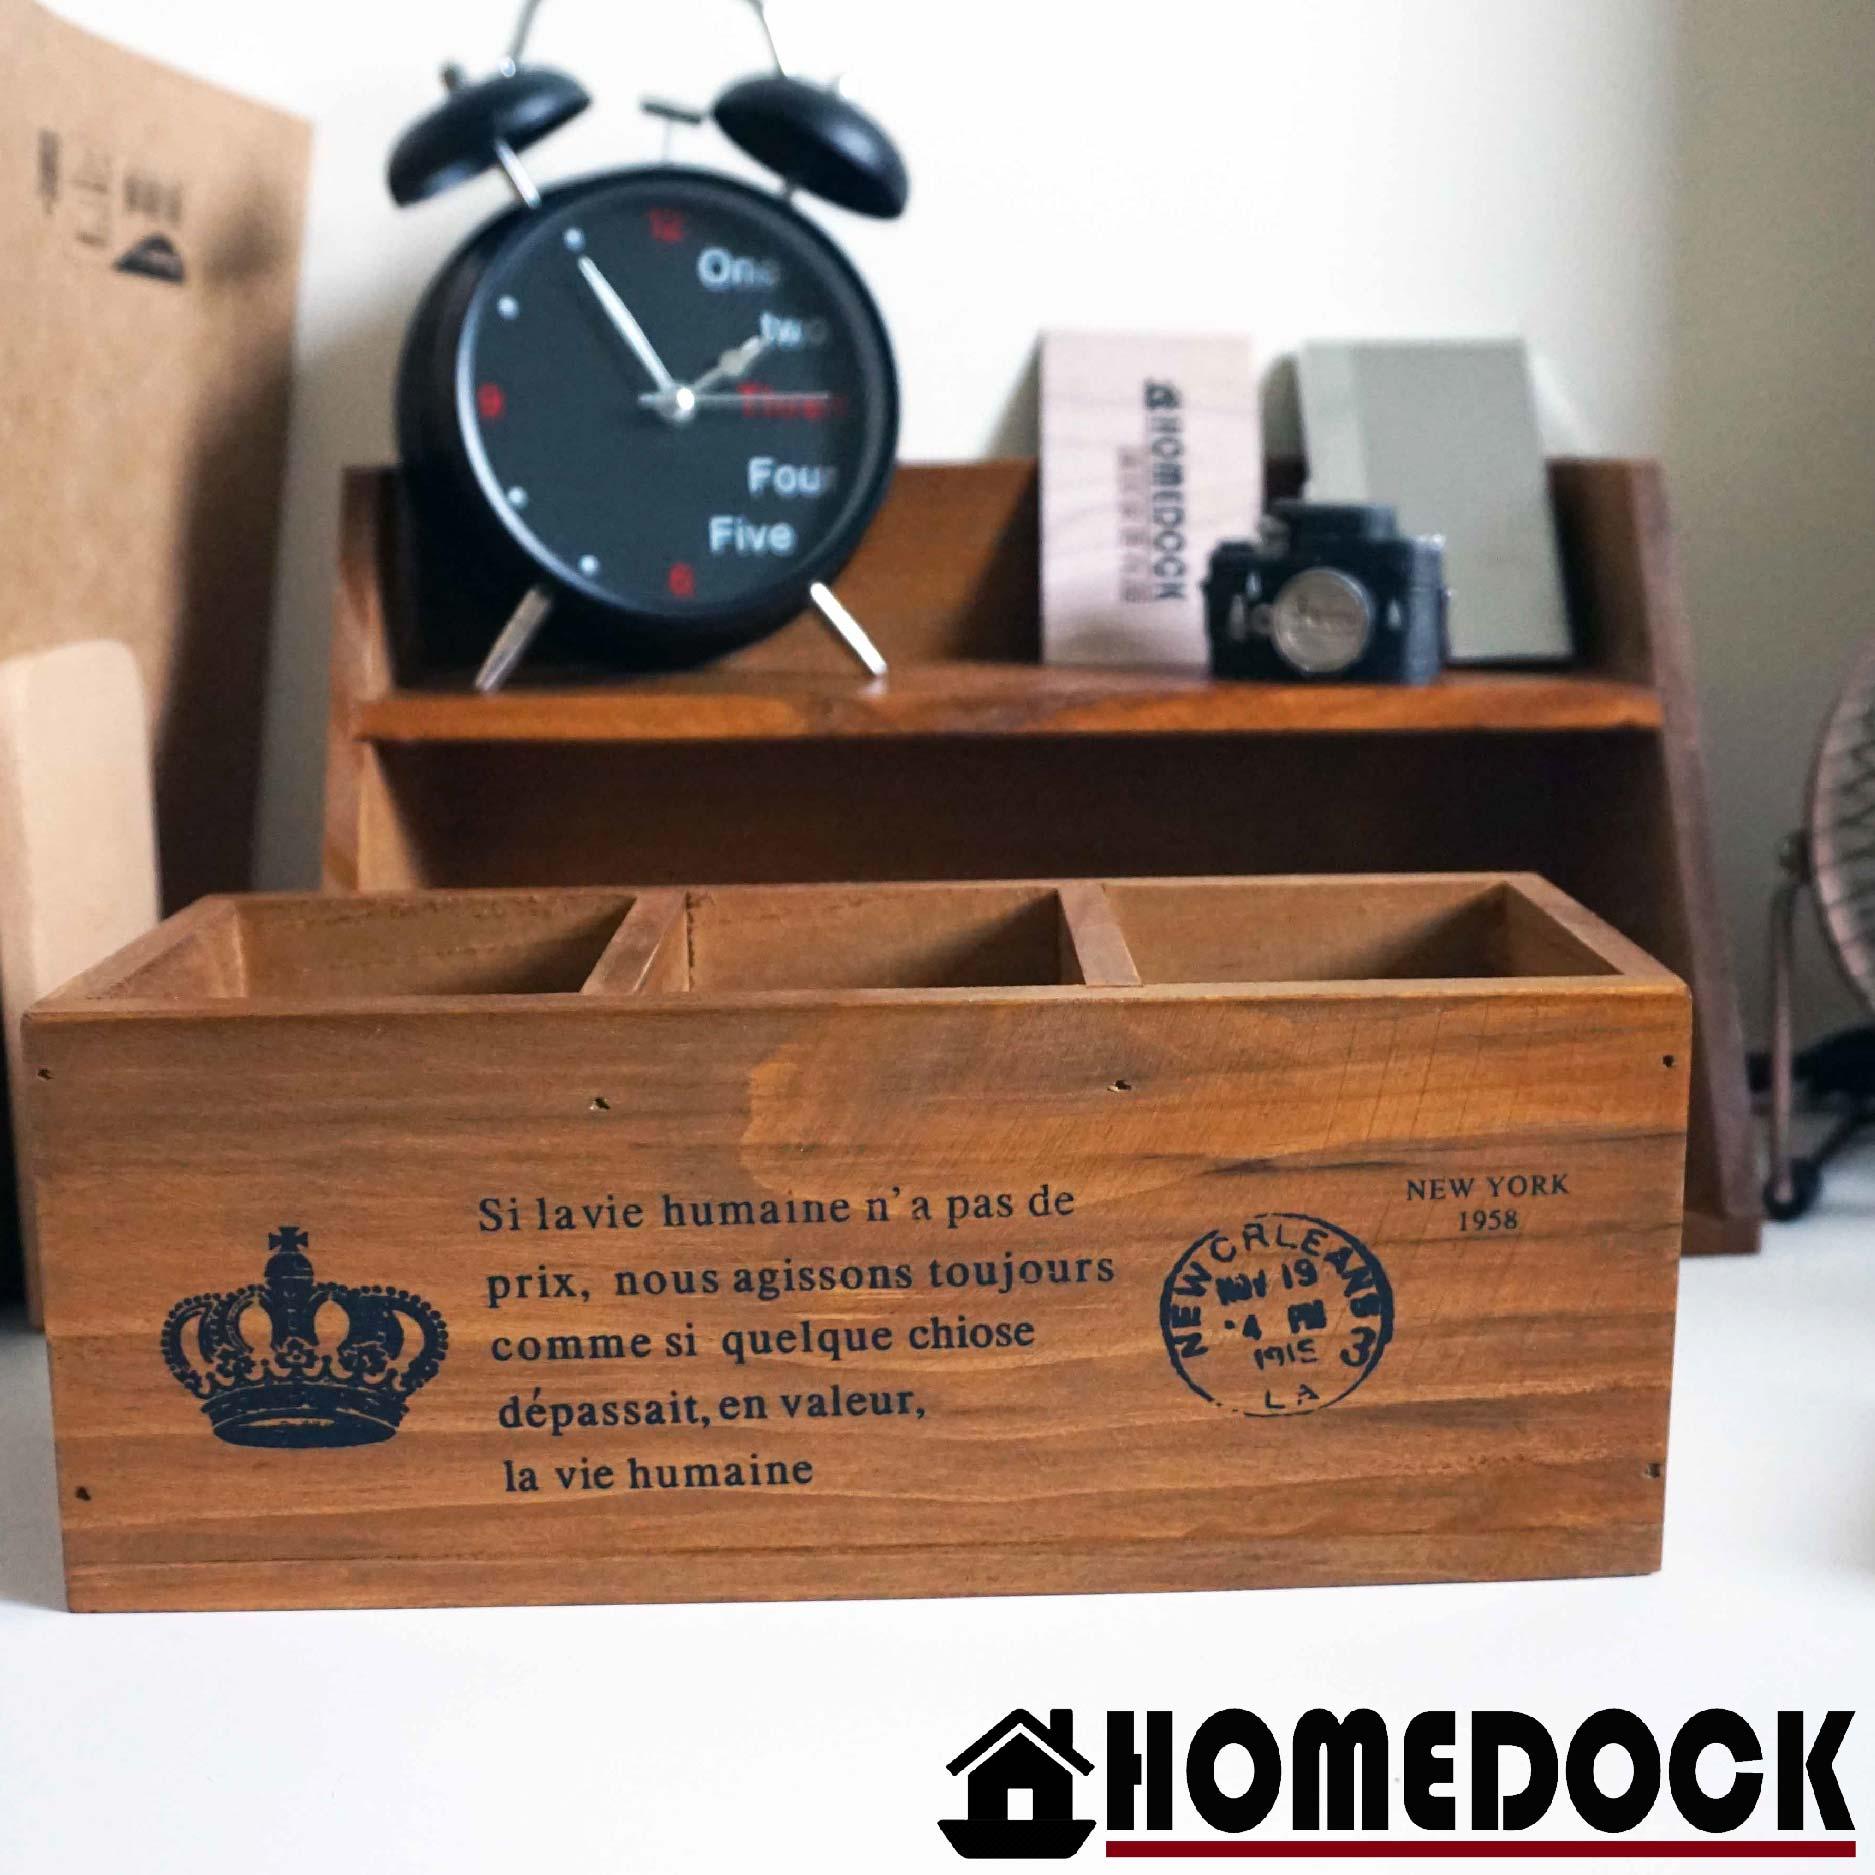 HOMEDOCK-原木質感三格收納筒 筆筒/文具收納/遙控器/Zakka/筒/桶/雜貨/書桌/客廳/木盒/收納